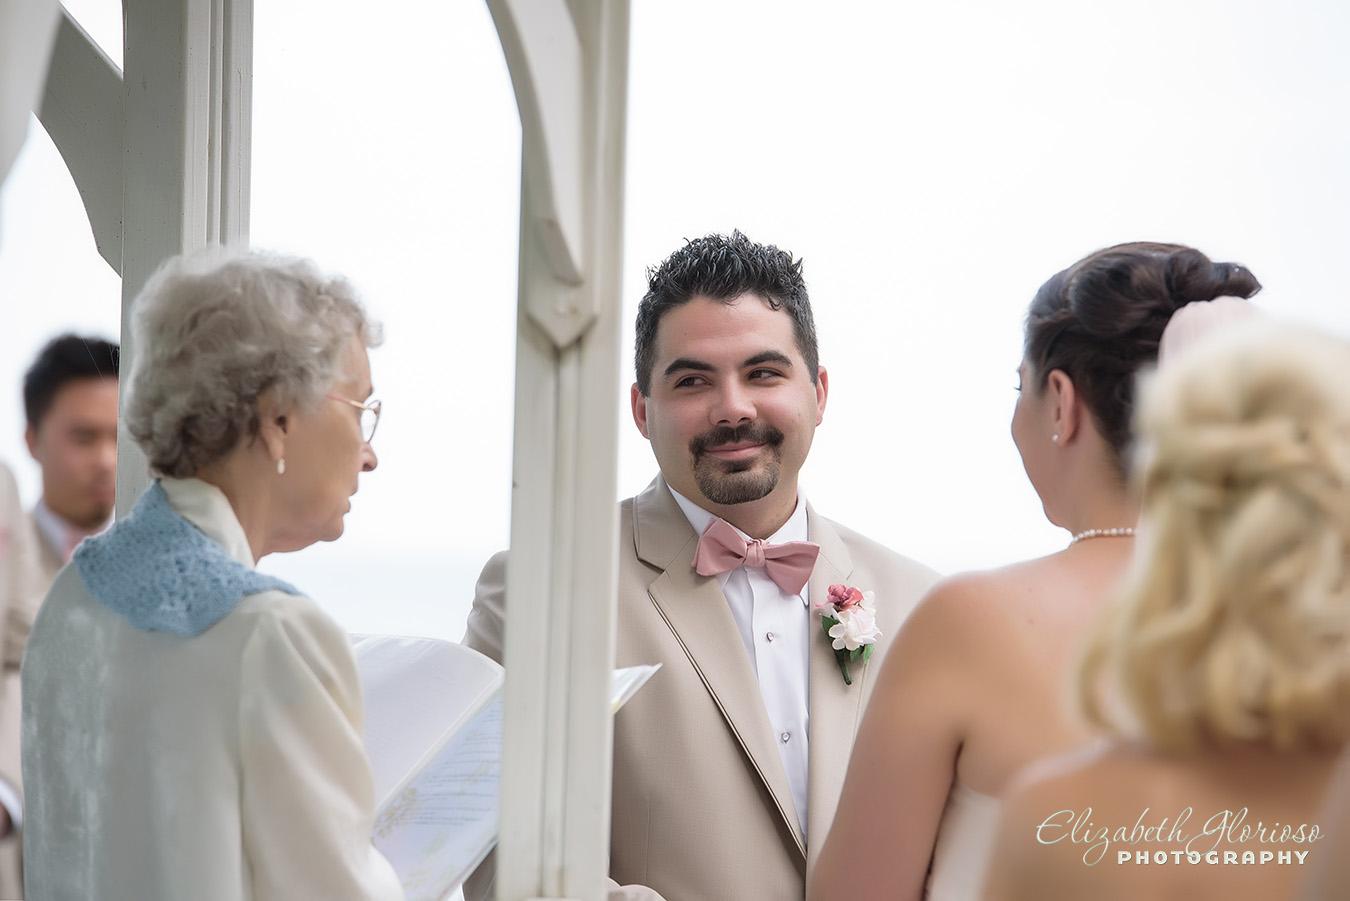 Vermilion_wedding_Glorioso Photography_1027